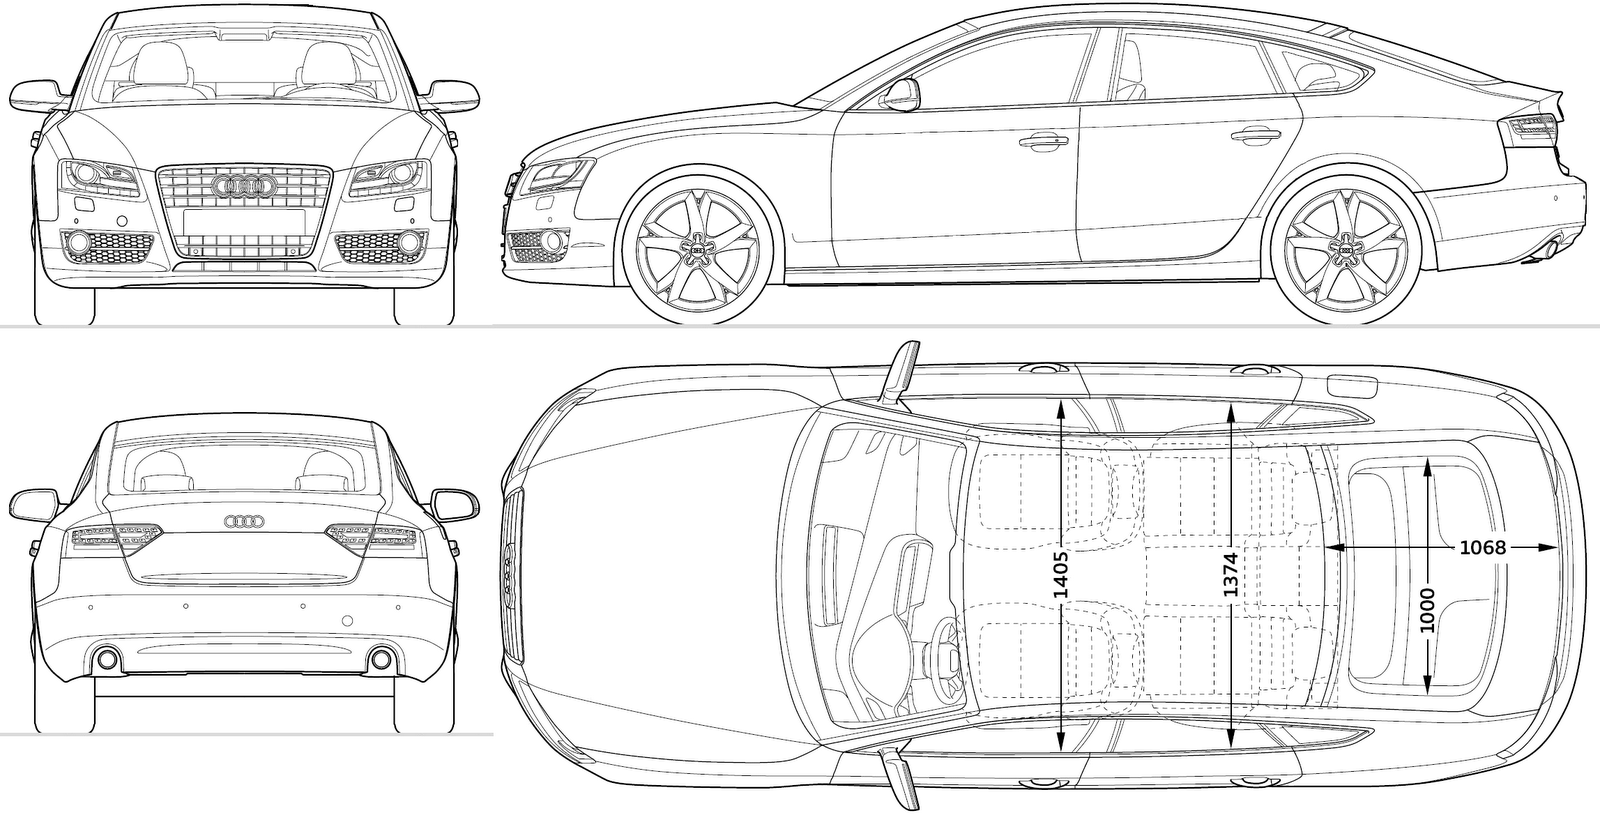 2014 Maycar Wiring Diagram Page 237